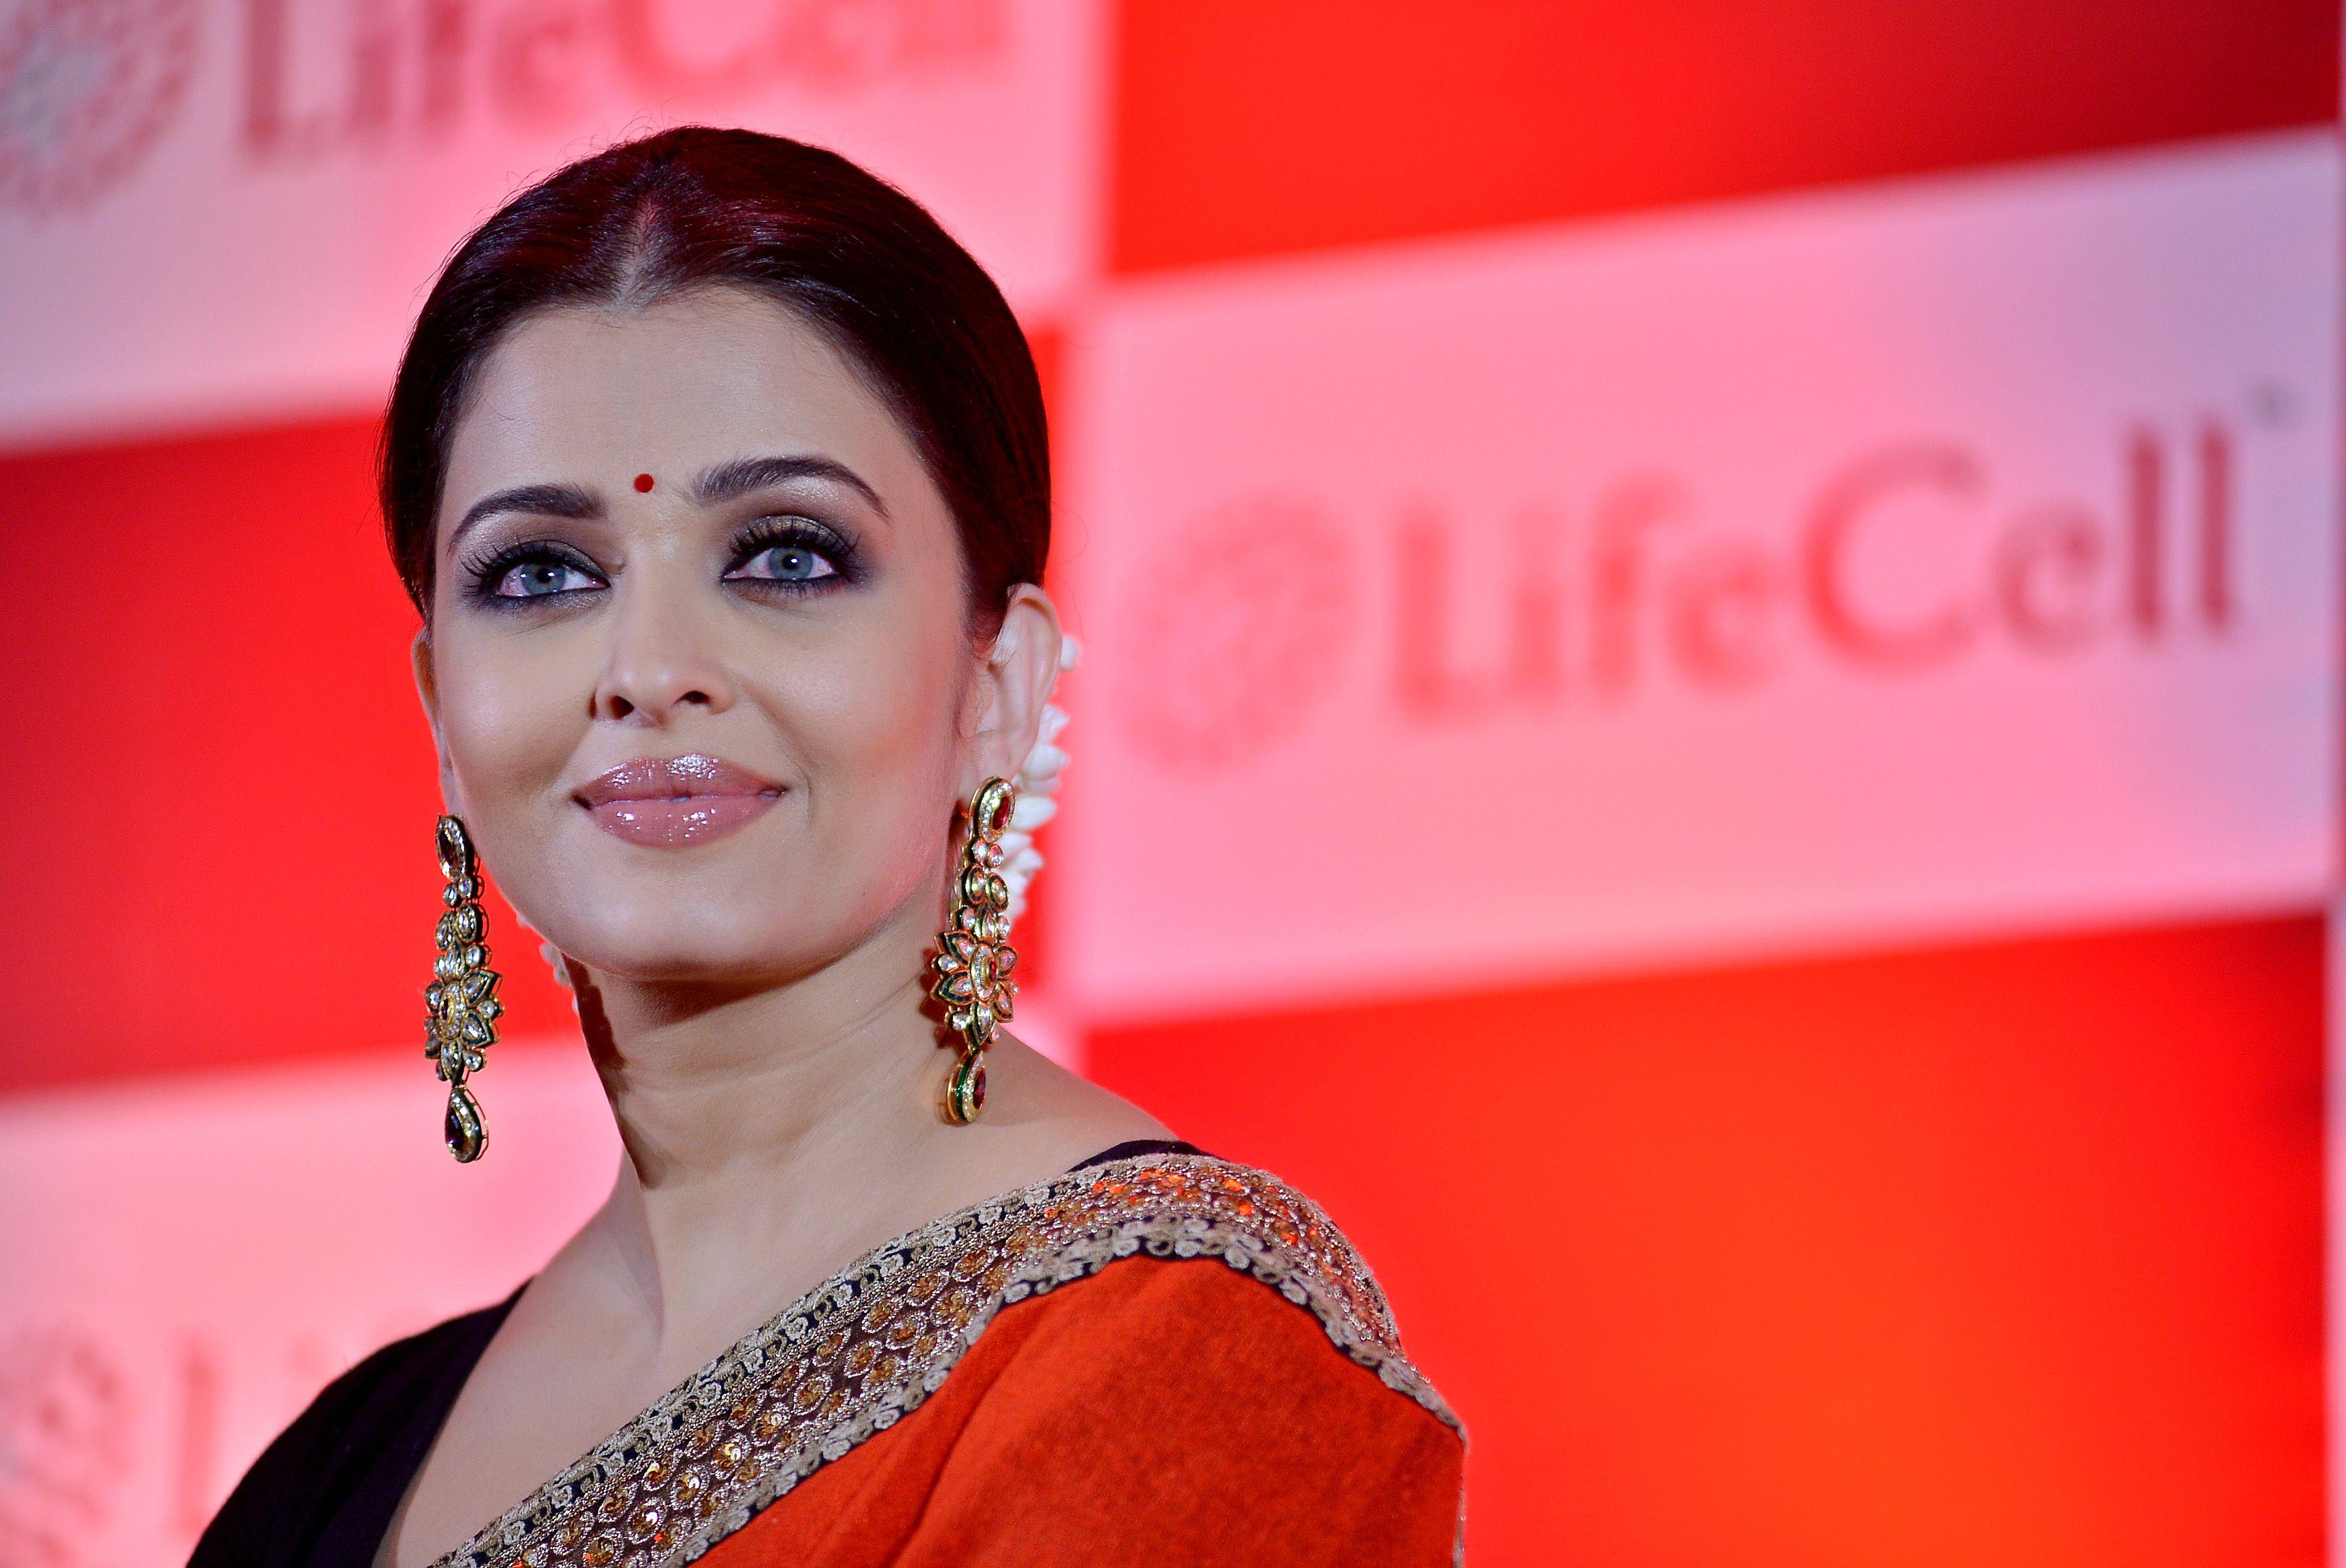 Aishwarya Rai LifeCell Event | AISHWARYA RAI BACHCHAN | Pinterest